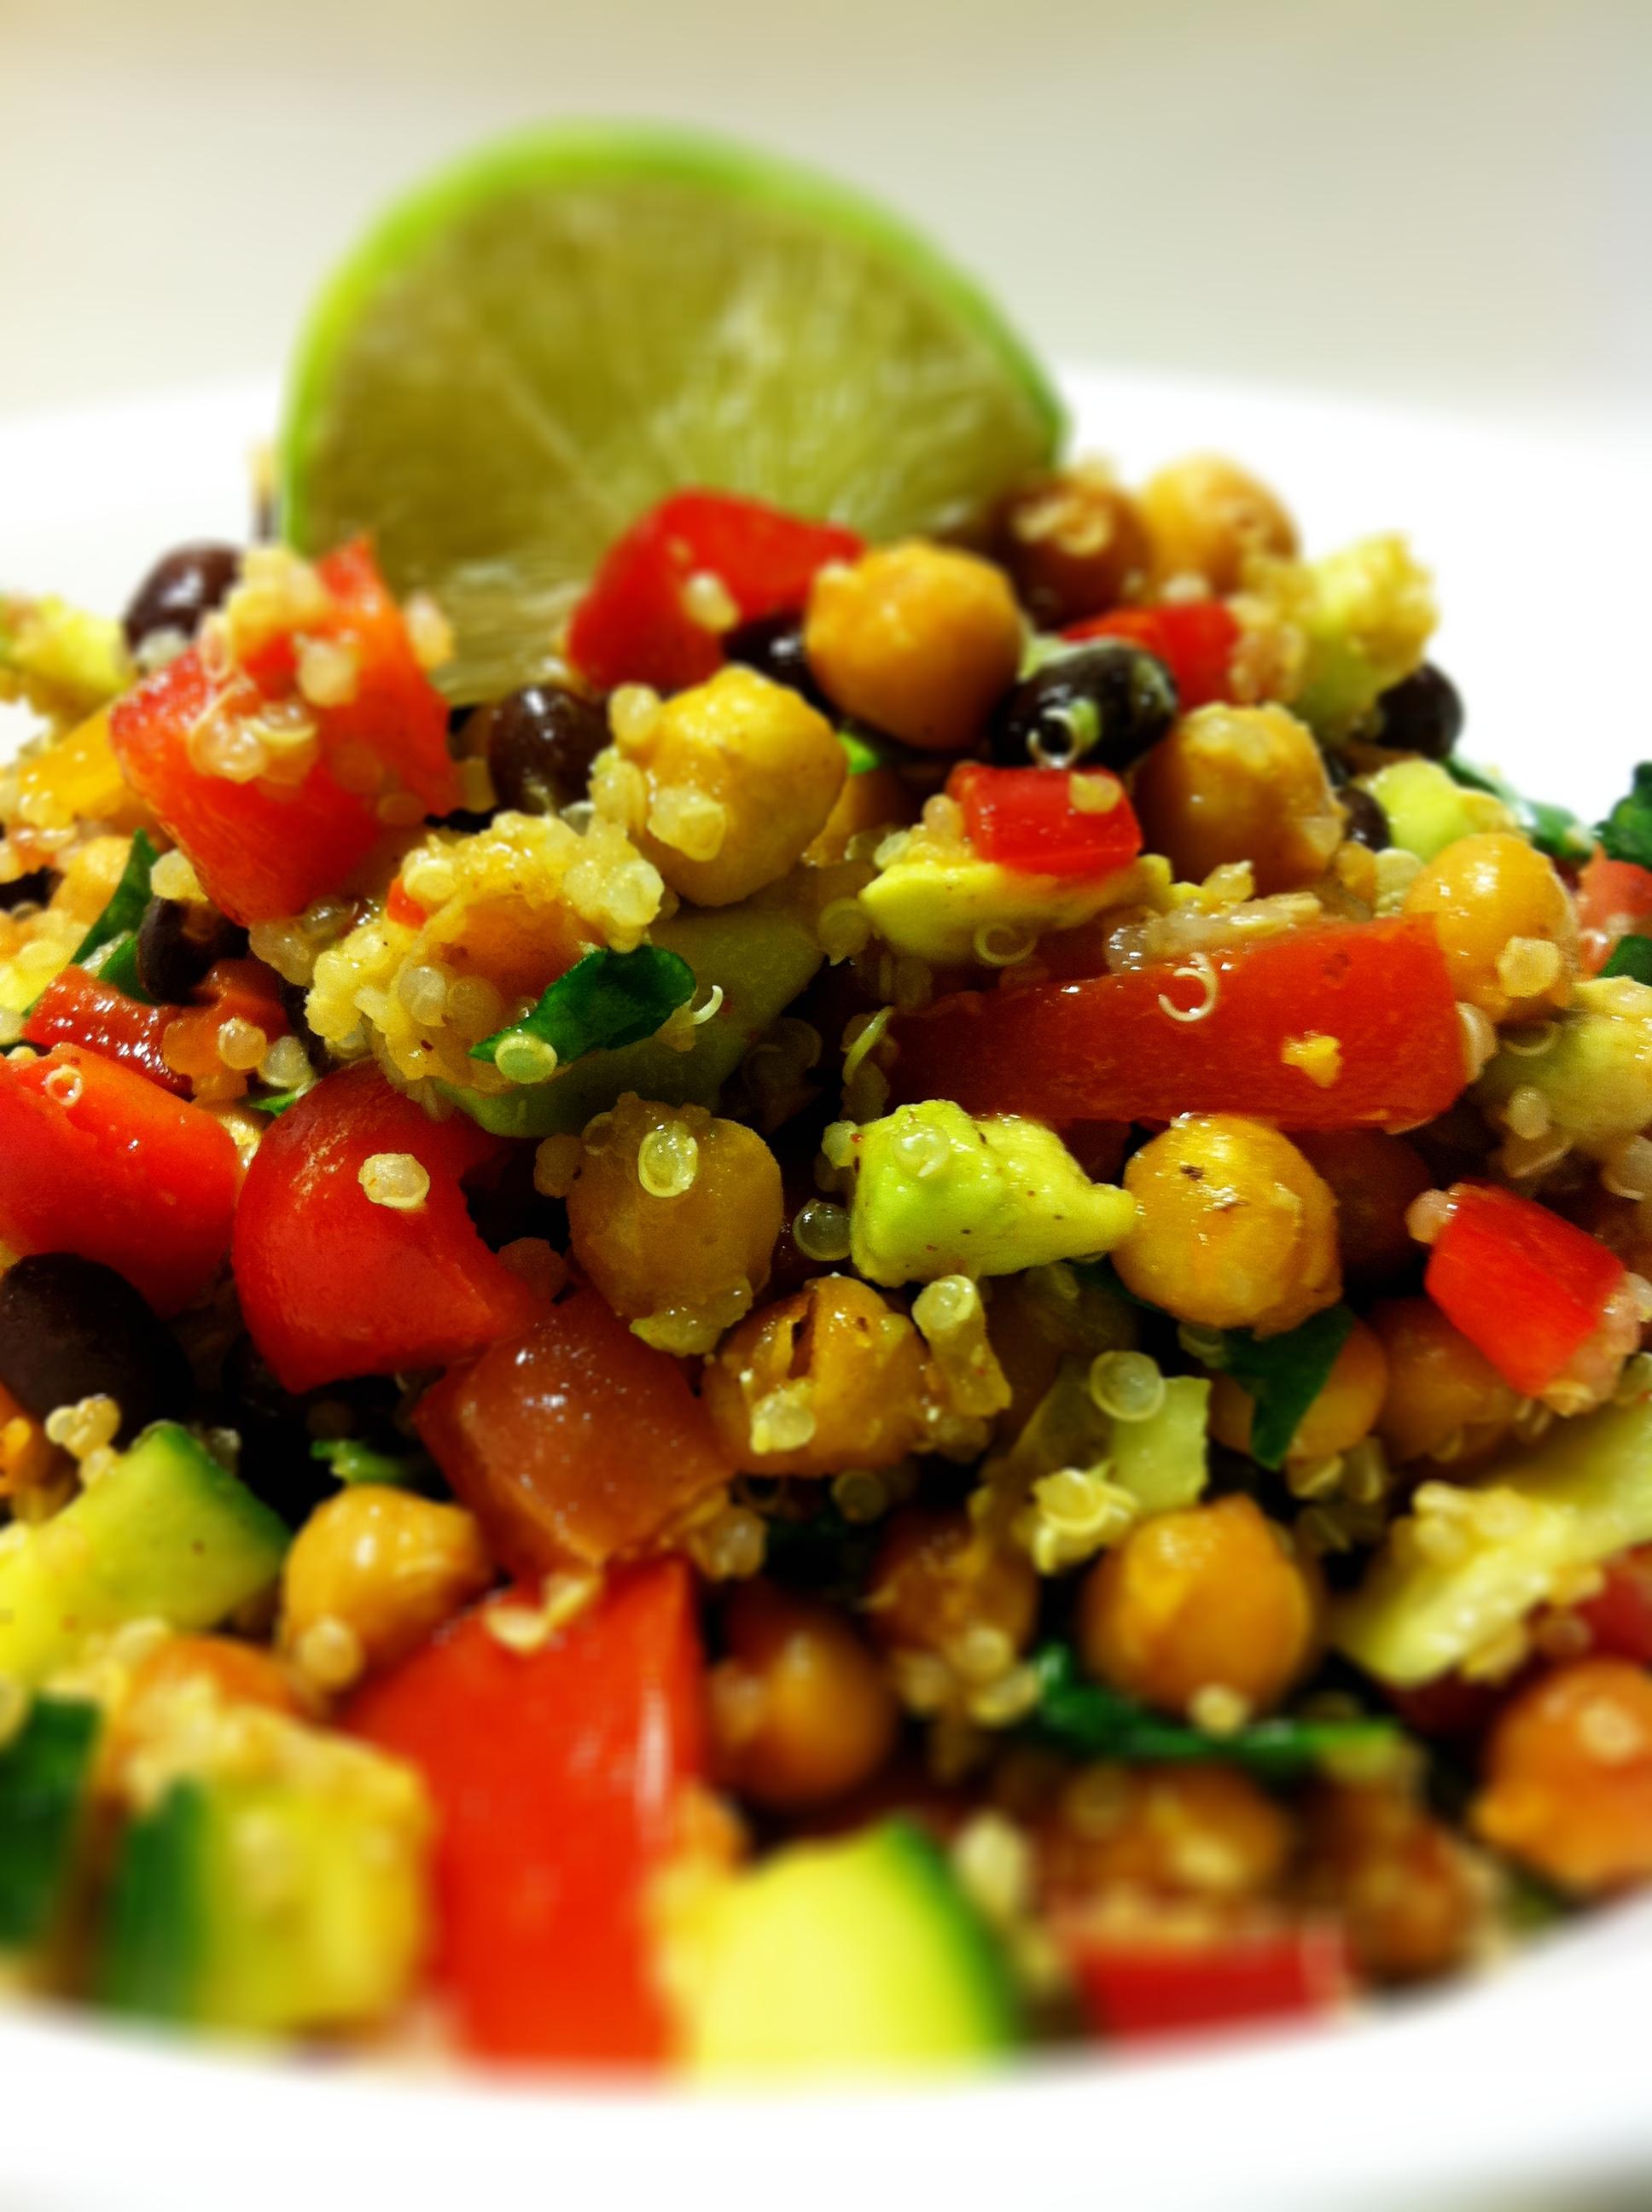 Ground Beef Taco Salad Recipe